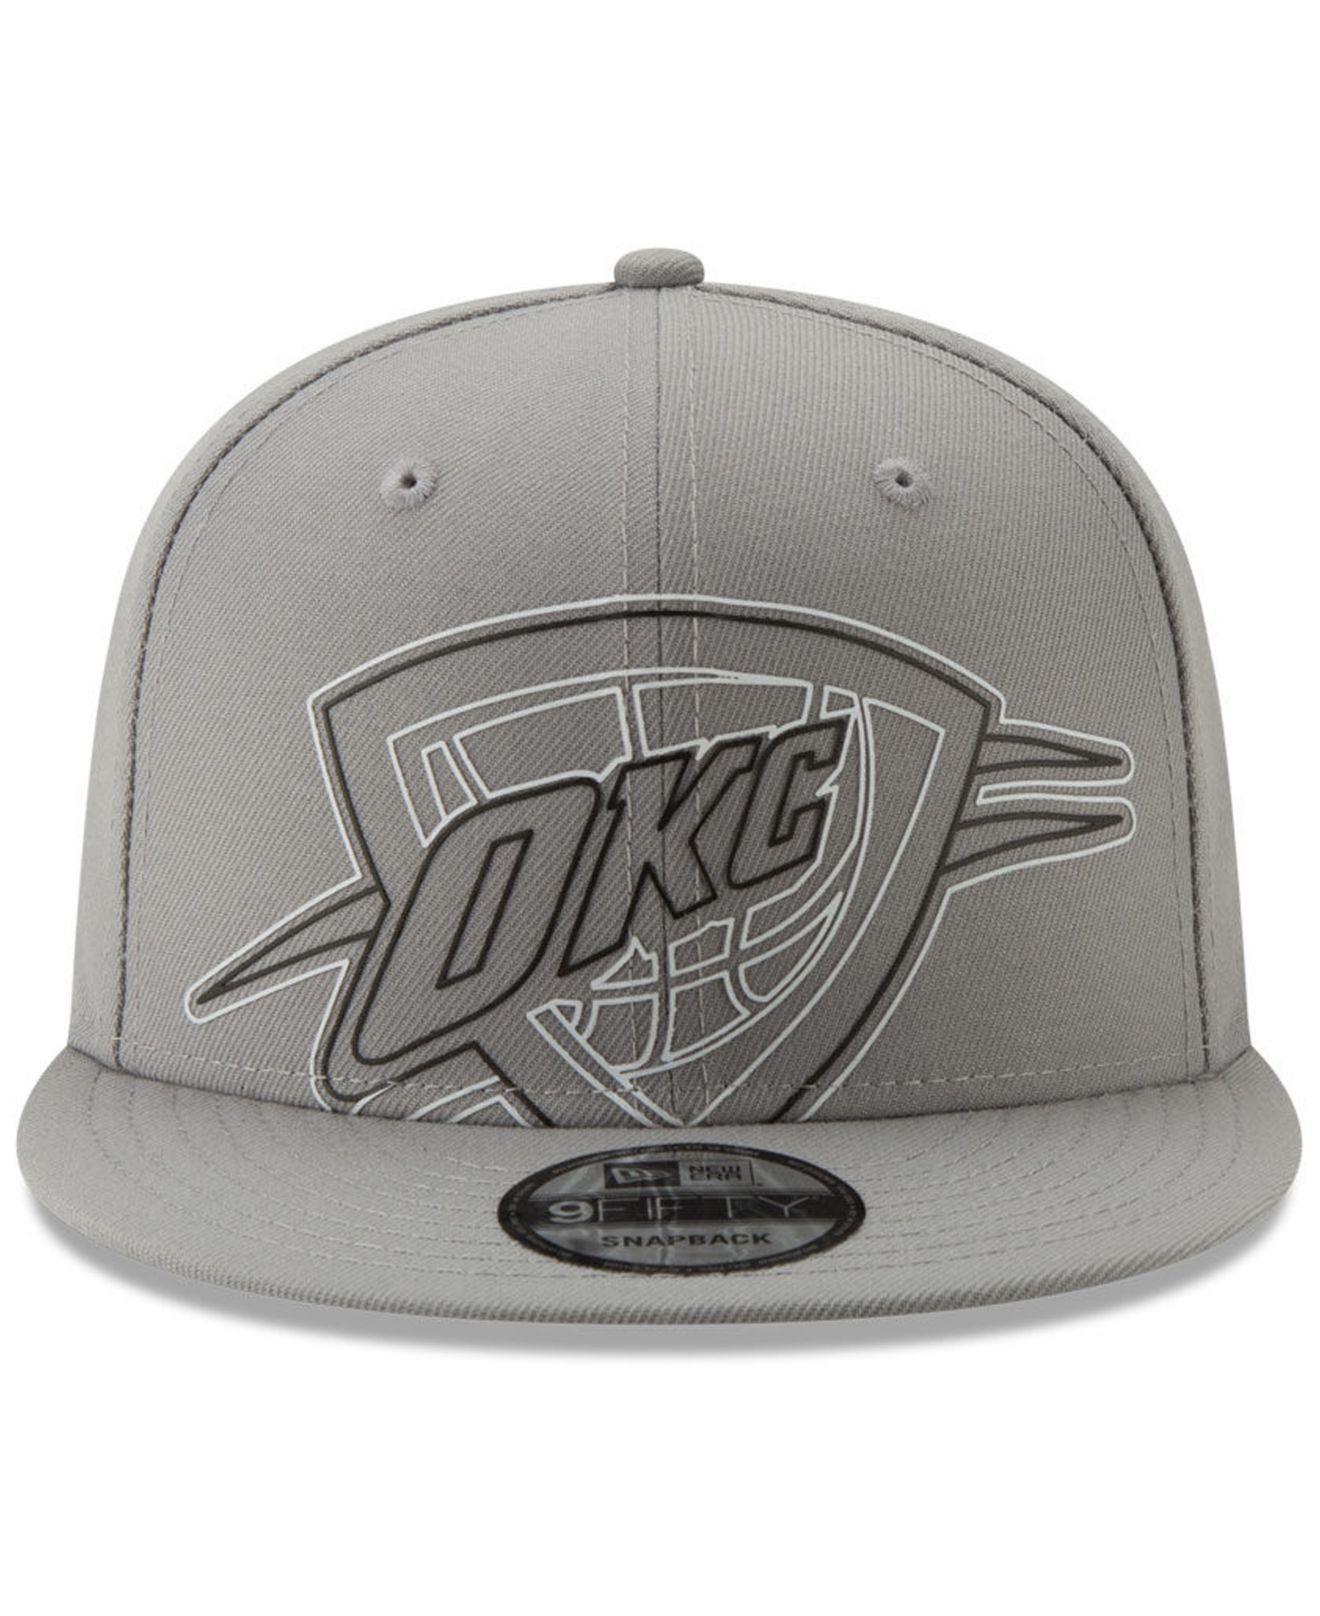 best sneakers f28e7 48f2d Lyst - KTZ Oklahoma City Thunder Light It Up Gray 9fifty Snapback Cap in  Gray for Men